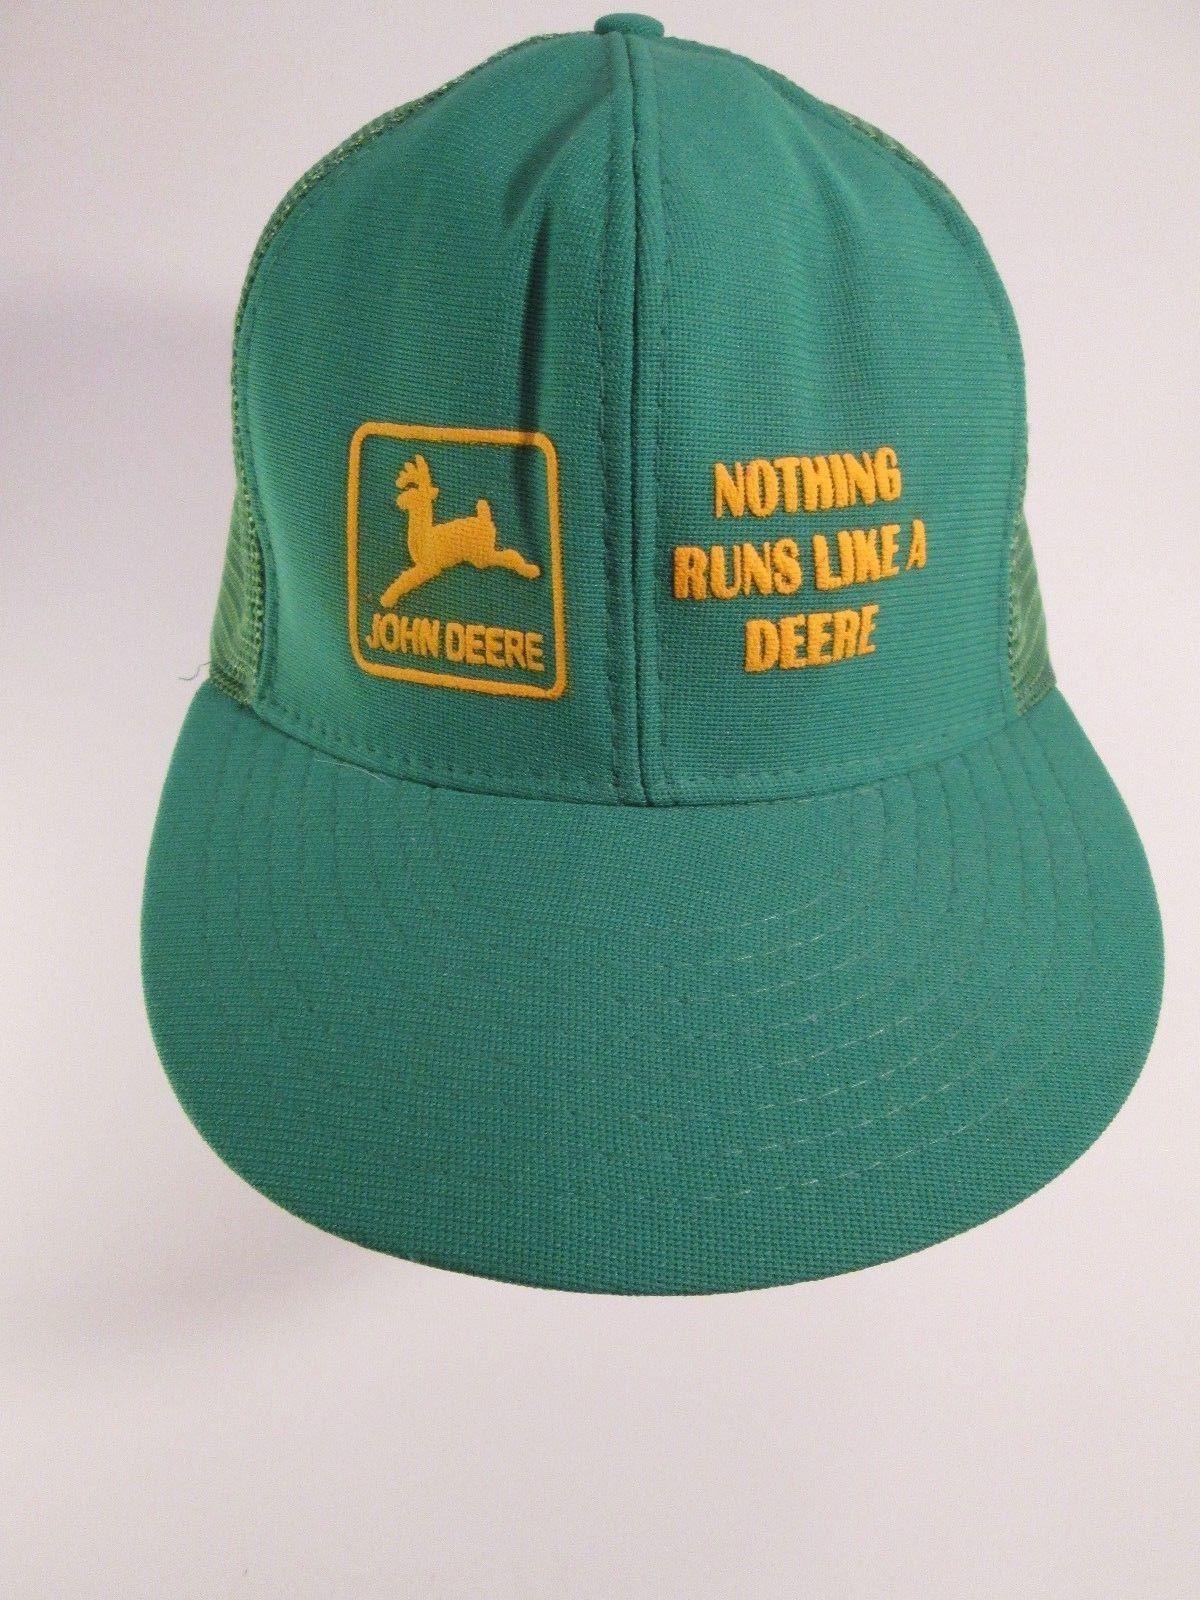 e5ddff76b89 57. 57. Previous. Vintage JOHN DEERE Nothing Runs Like 80s US Crown Mesh  Trucker Hat Cap Snapback